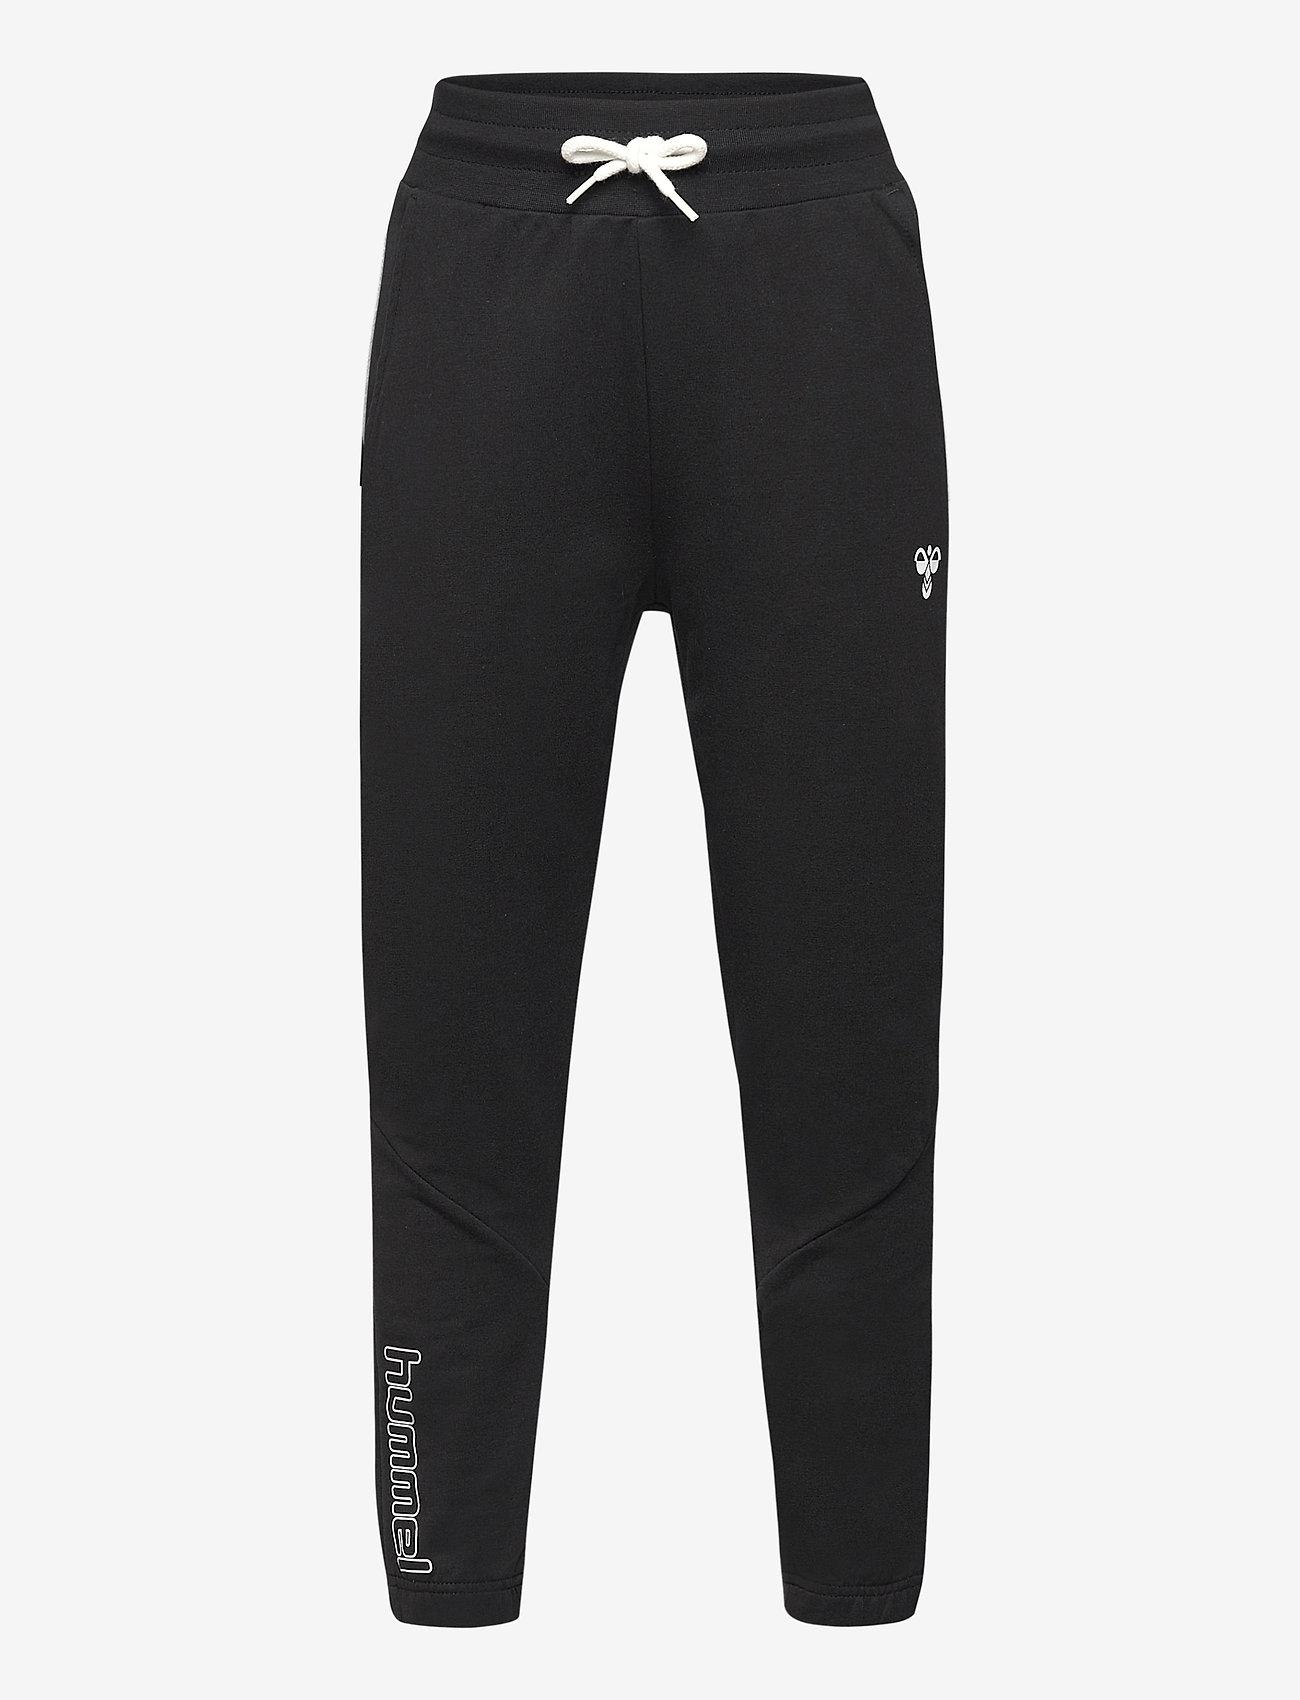 Hummel - hmlNUEVE PANTS - sweatpants - black - 0